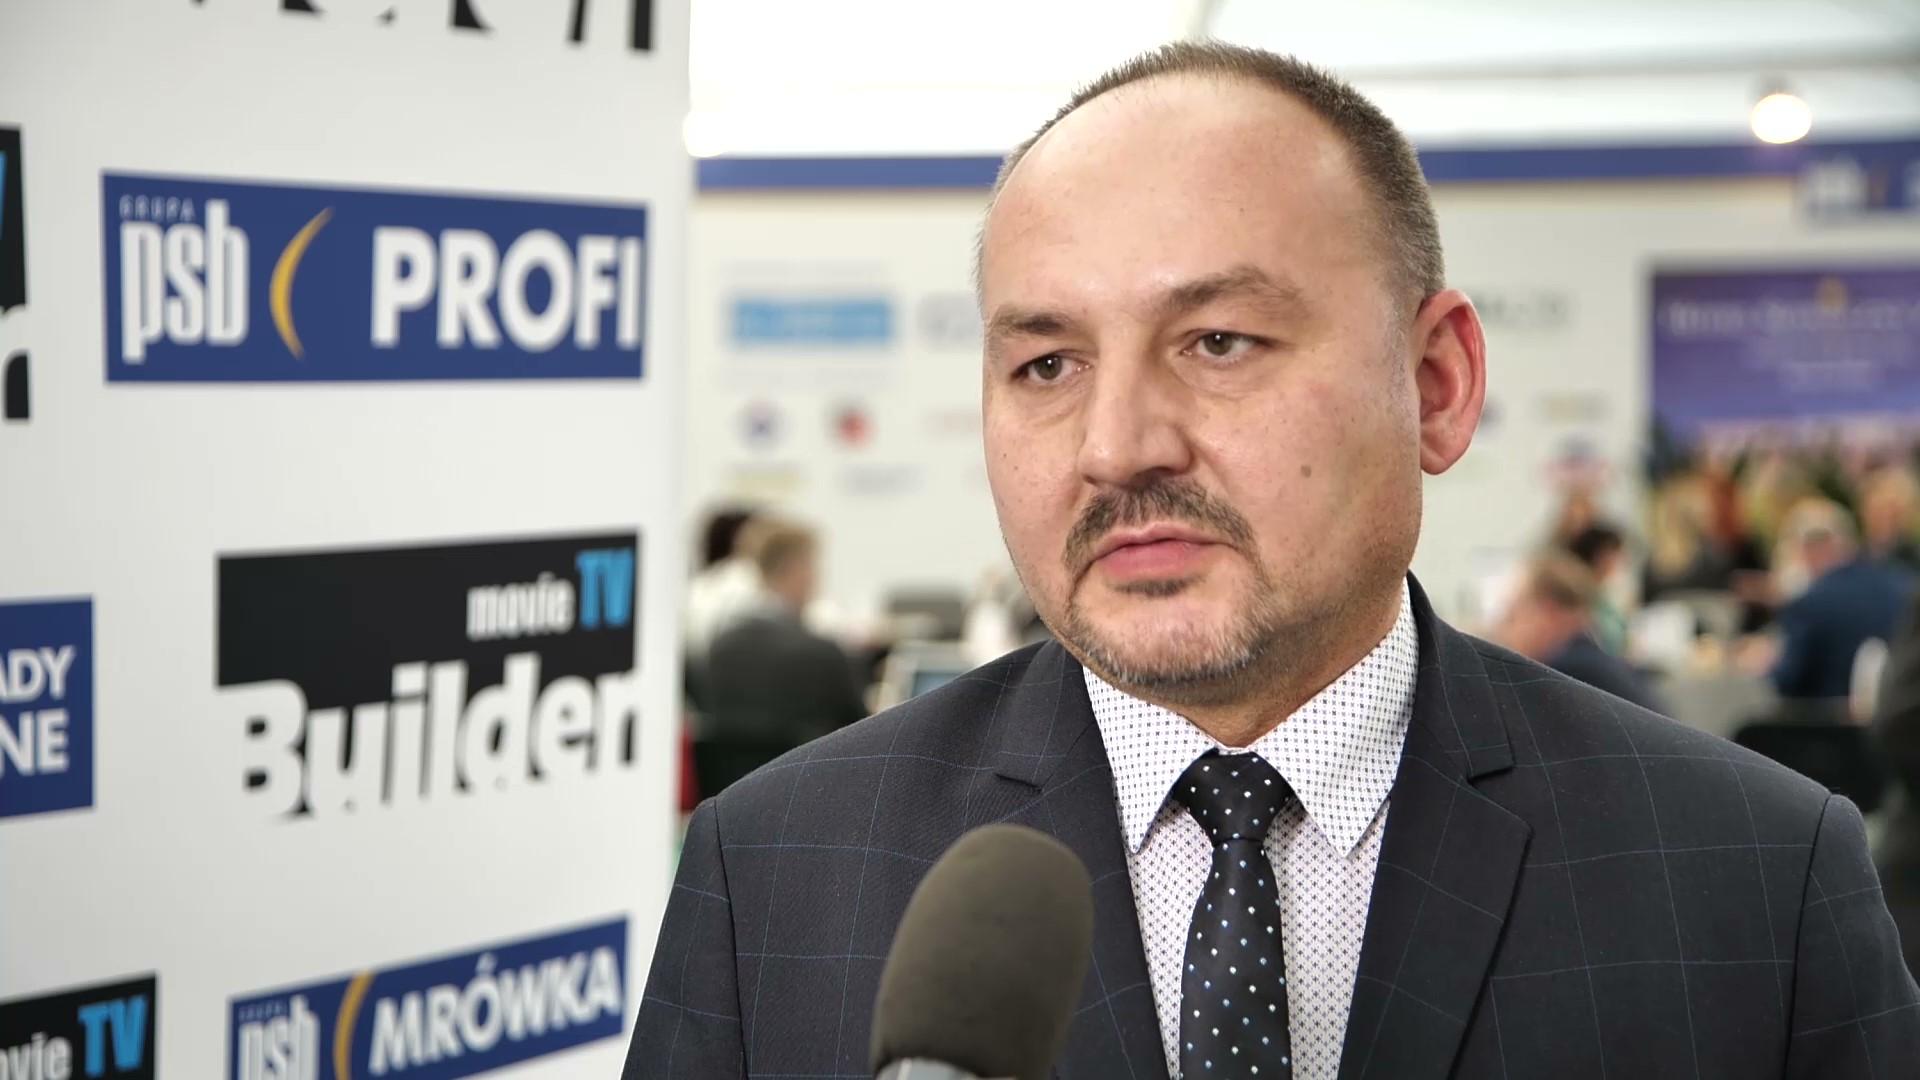 TARGI GRUPY PSB 2020 – PIOTR KOBIELA, TROPS S.A